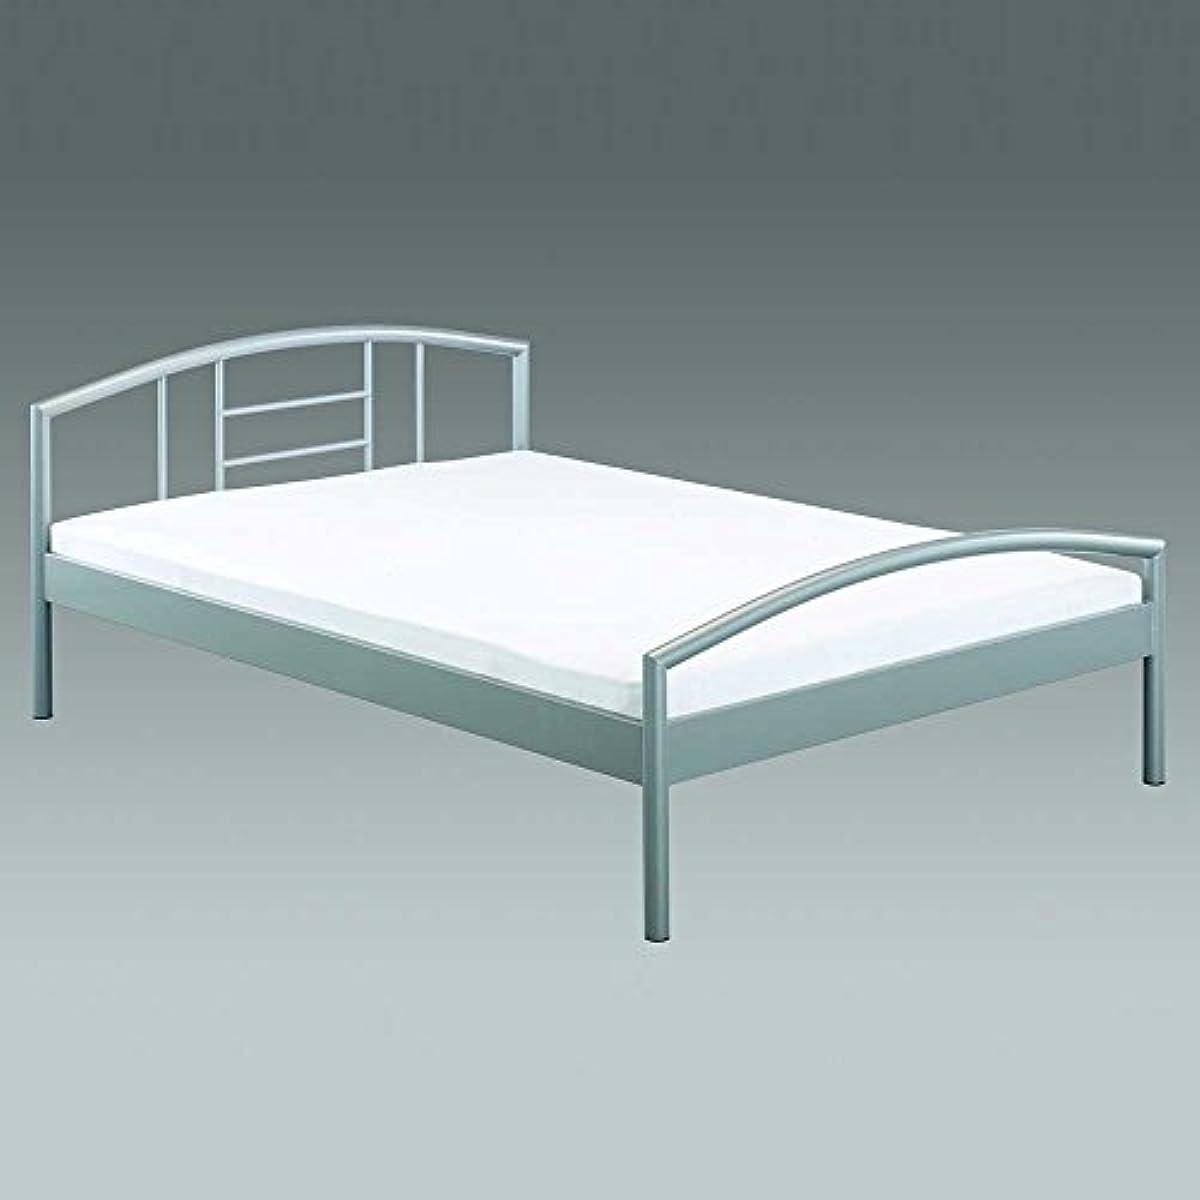 Metallbett 140x200 silber  Bett - 140x200 - Silber | Online kaufen